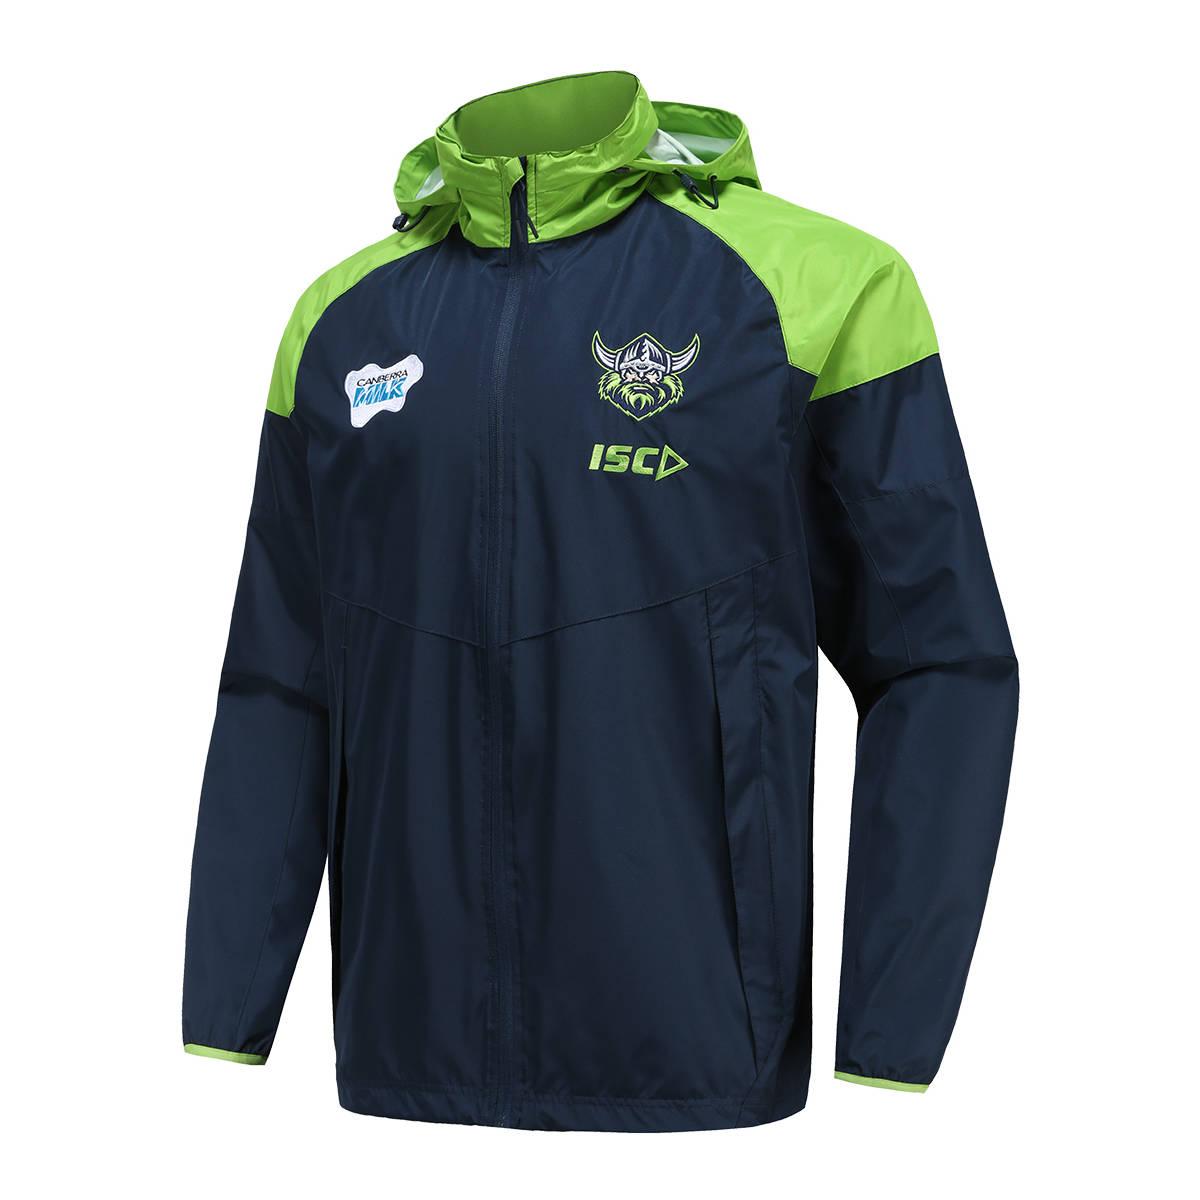 2021 Adults Wet Weather Jacket2